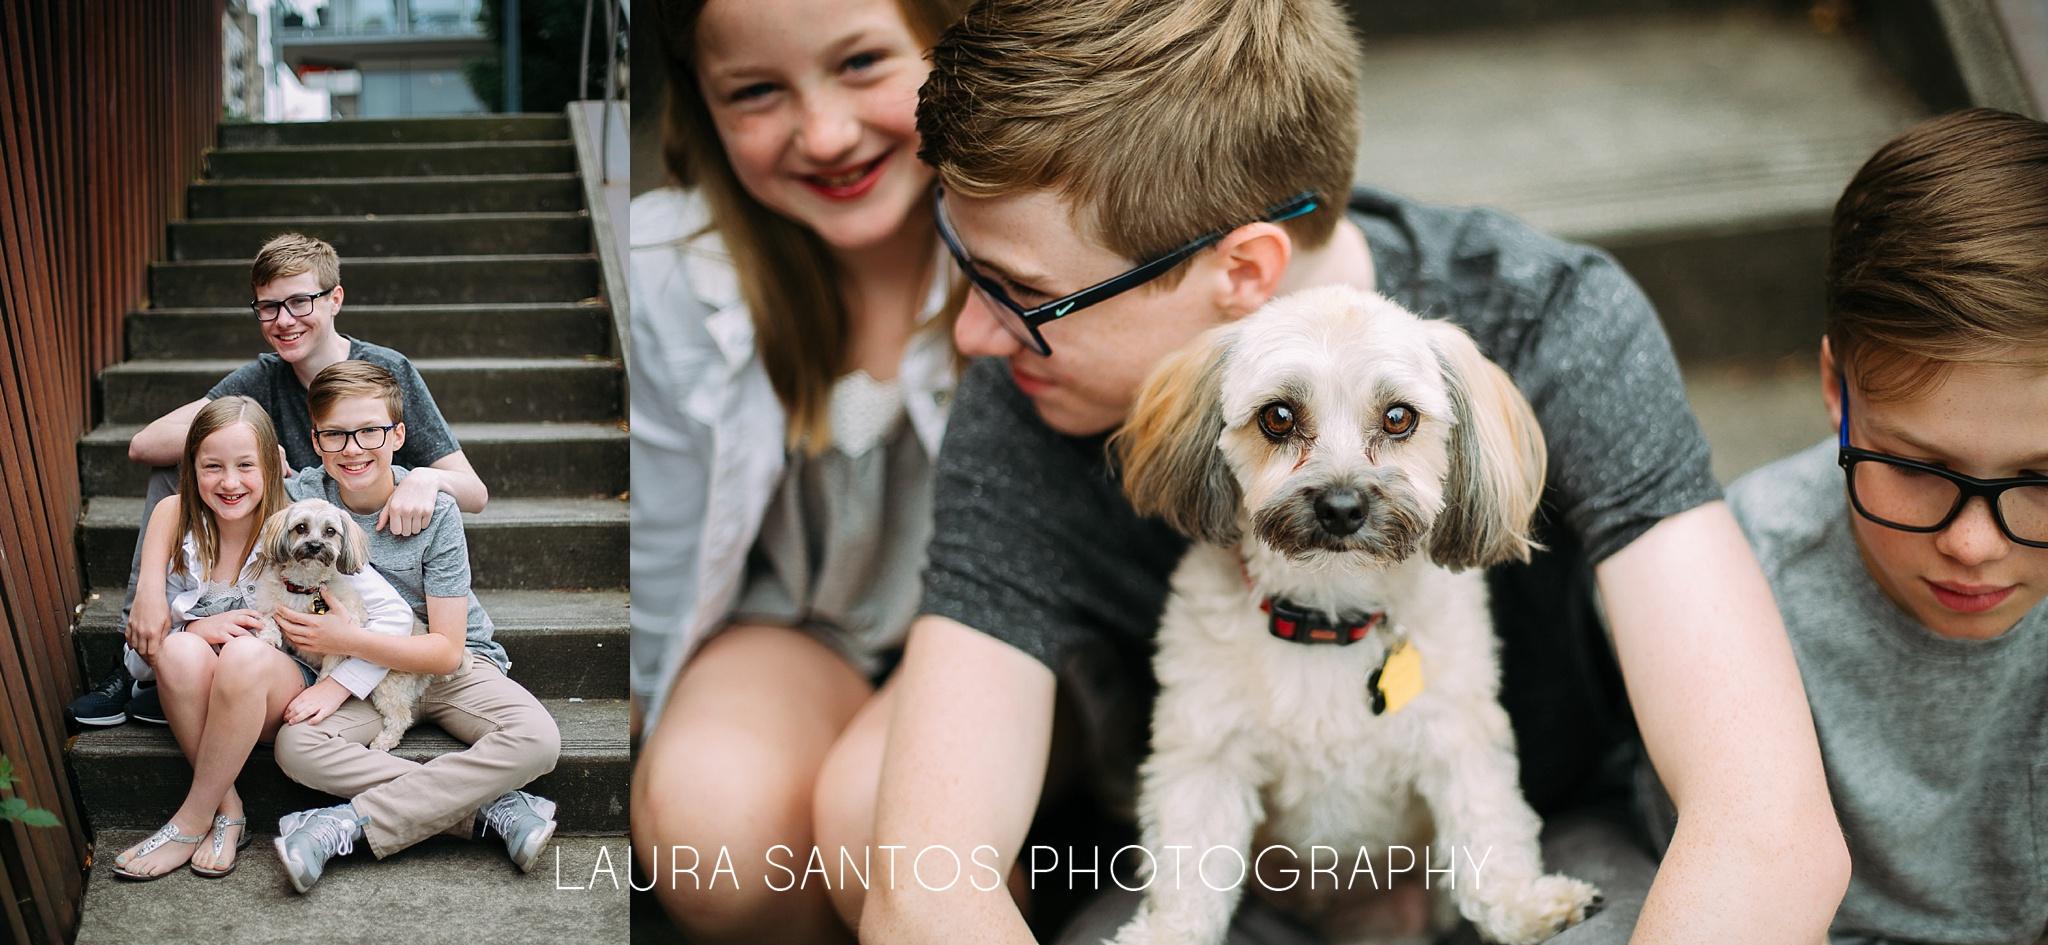 Laura Santos Photography Portland Oregon Family Photographer_0440.jpg